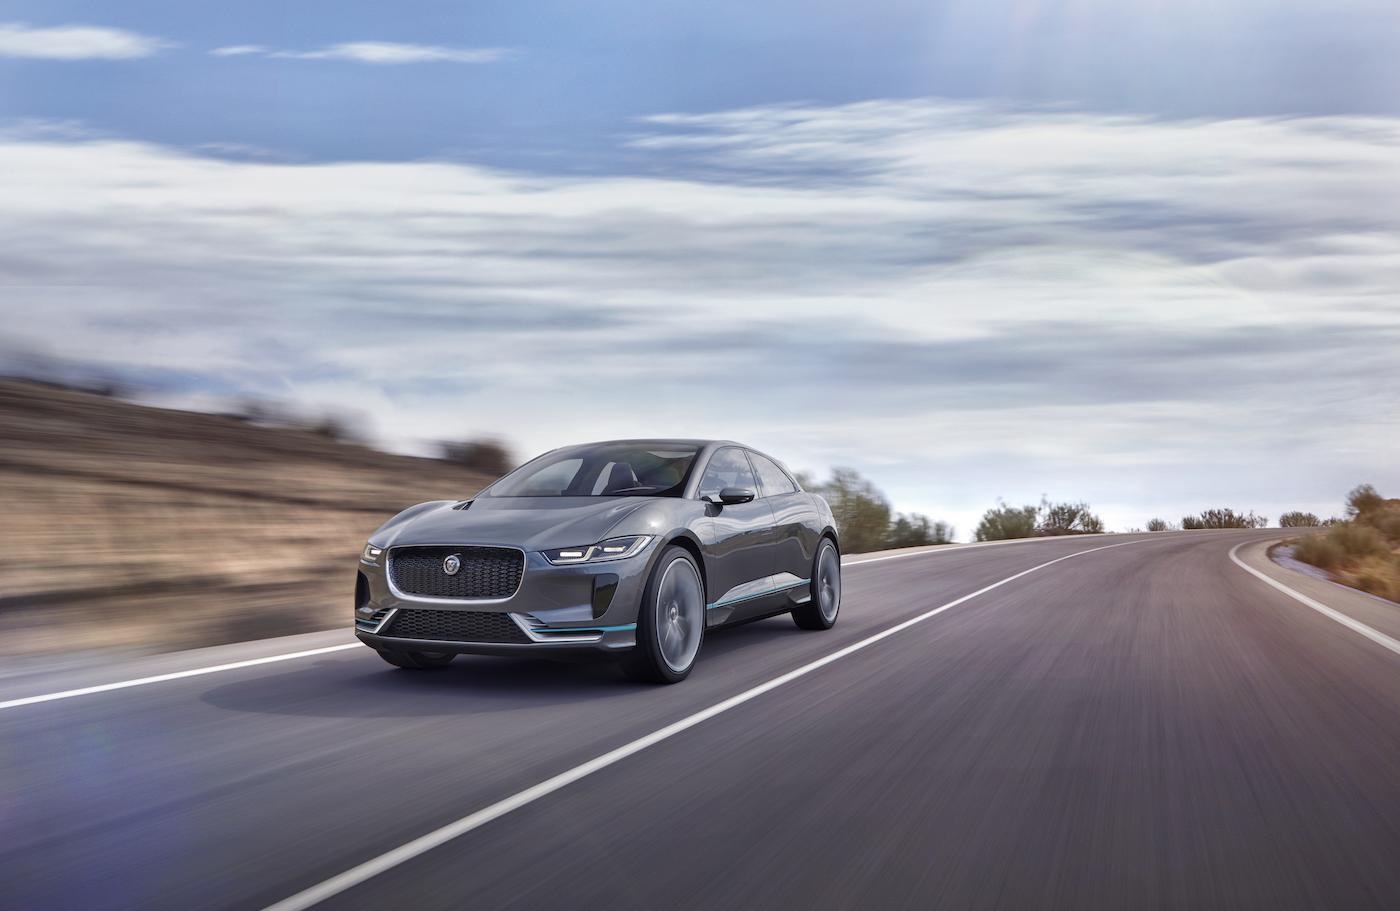 Der neue i-Pace: So will Jaguar Tesla & Co. angreifen 3